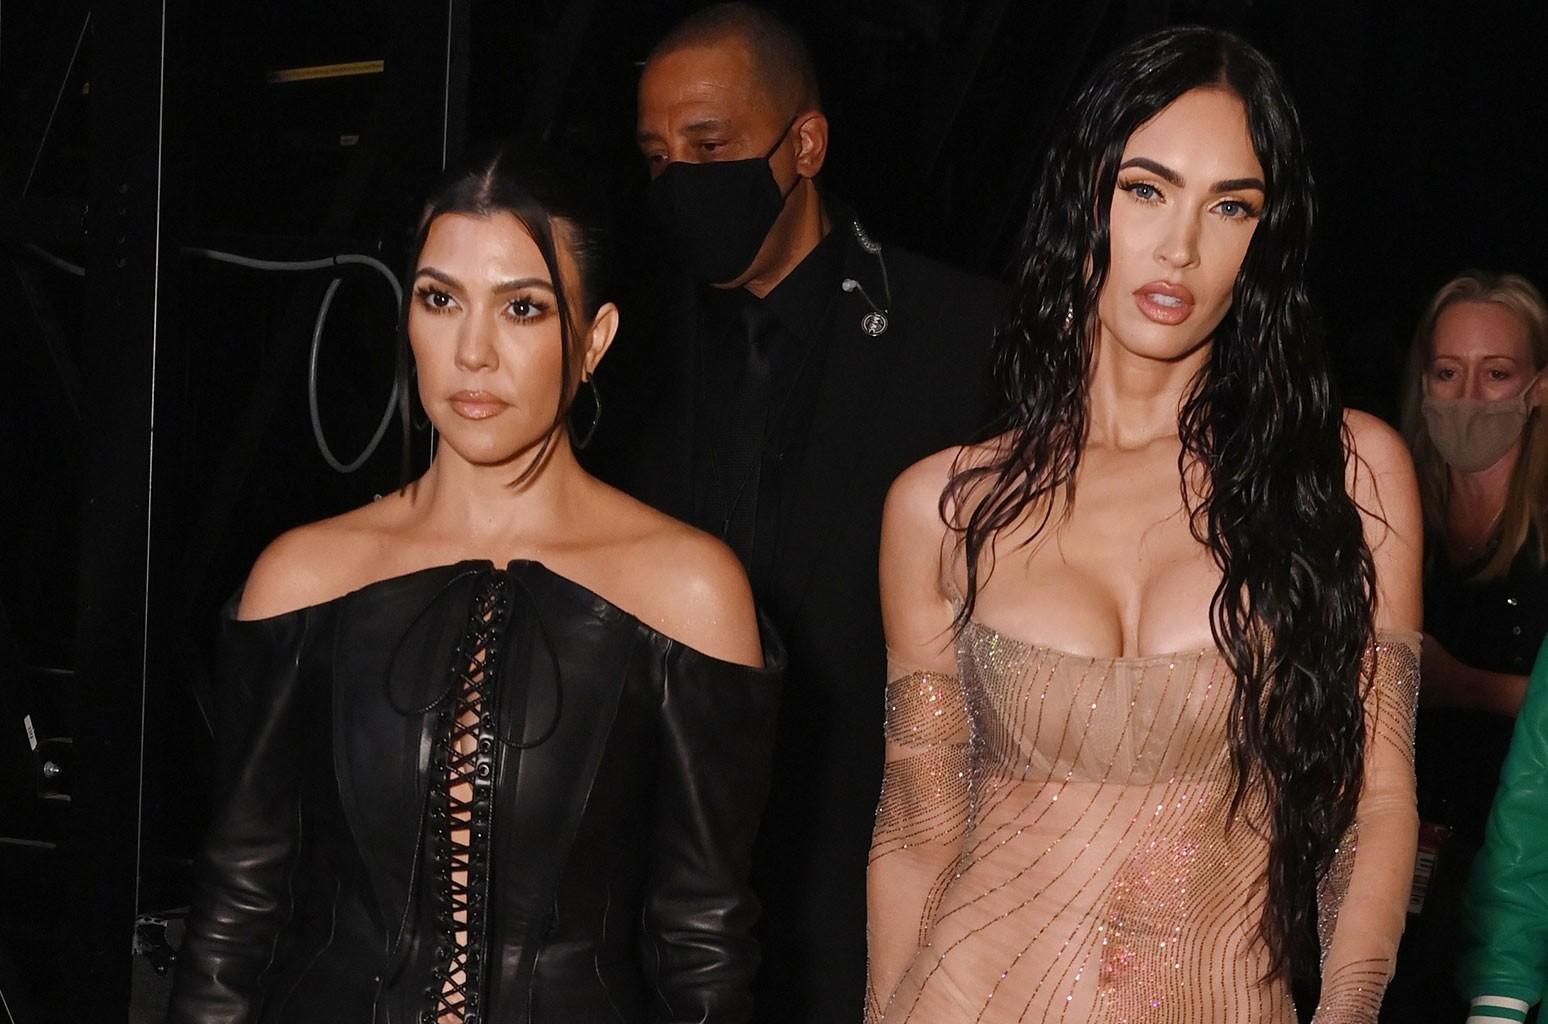 Kourtney Kardashian, Megan Fox